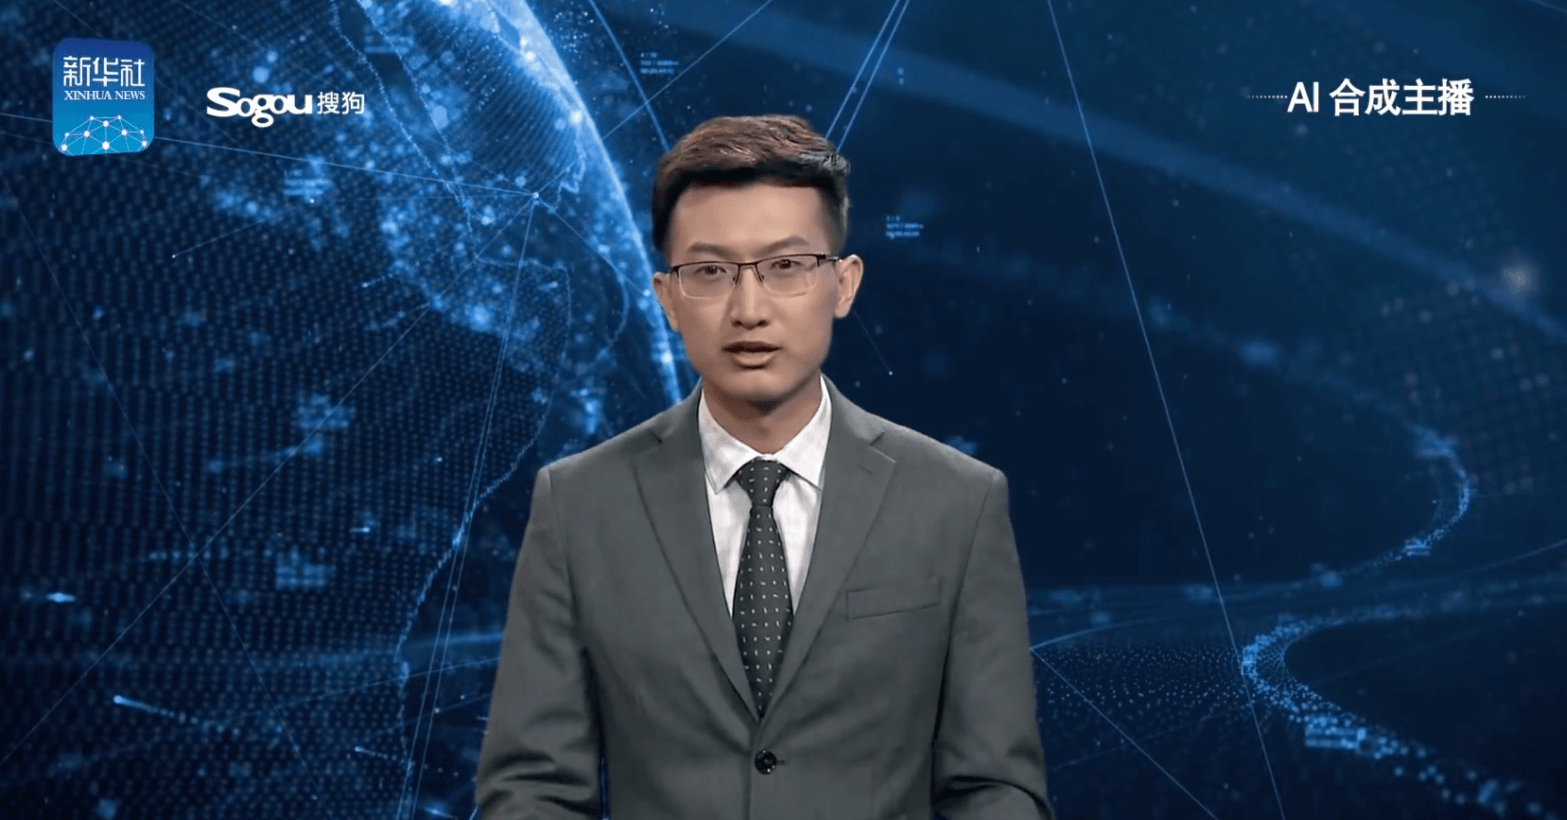 China debuts creepy AI that reads the news like a real(ish) anchor